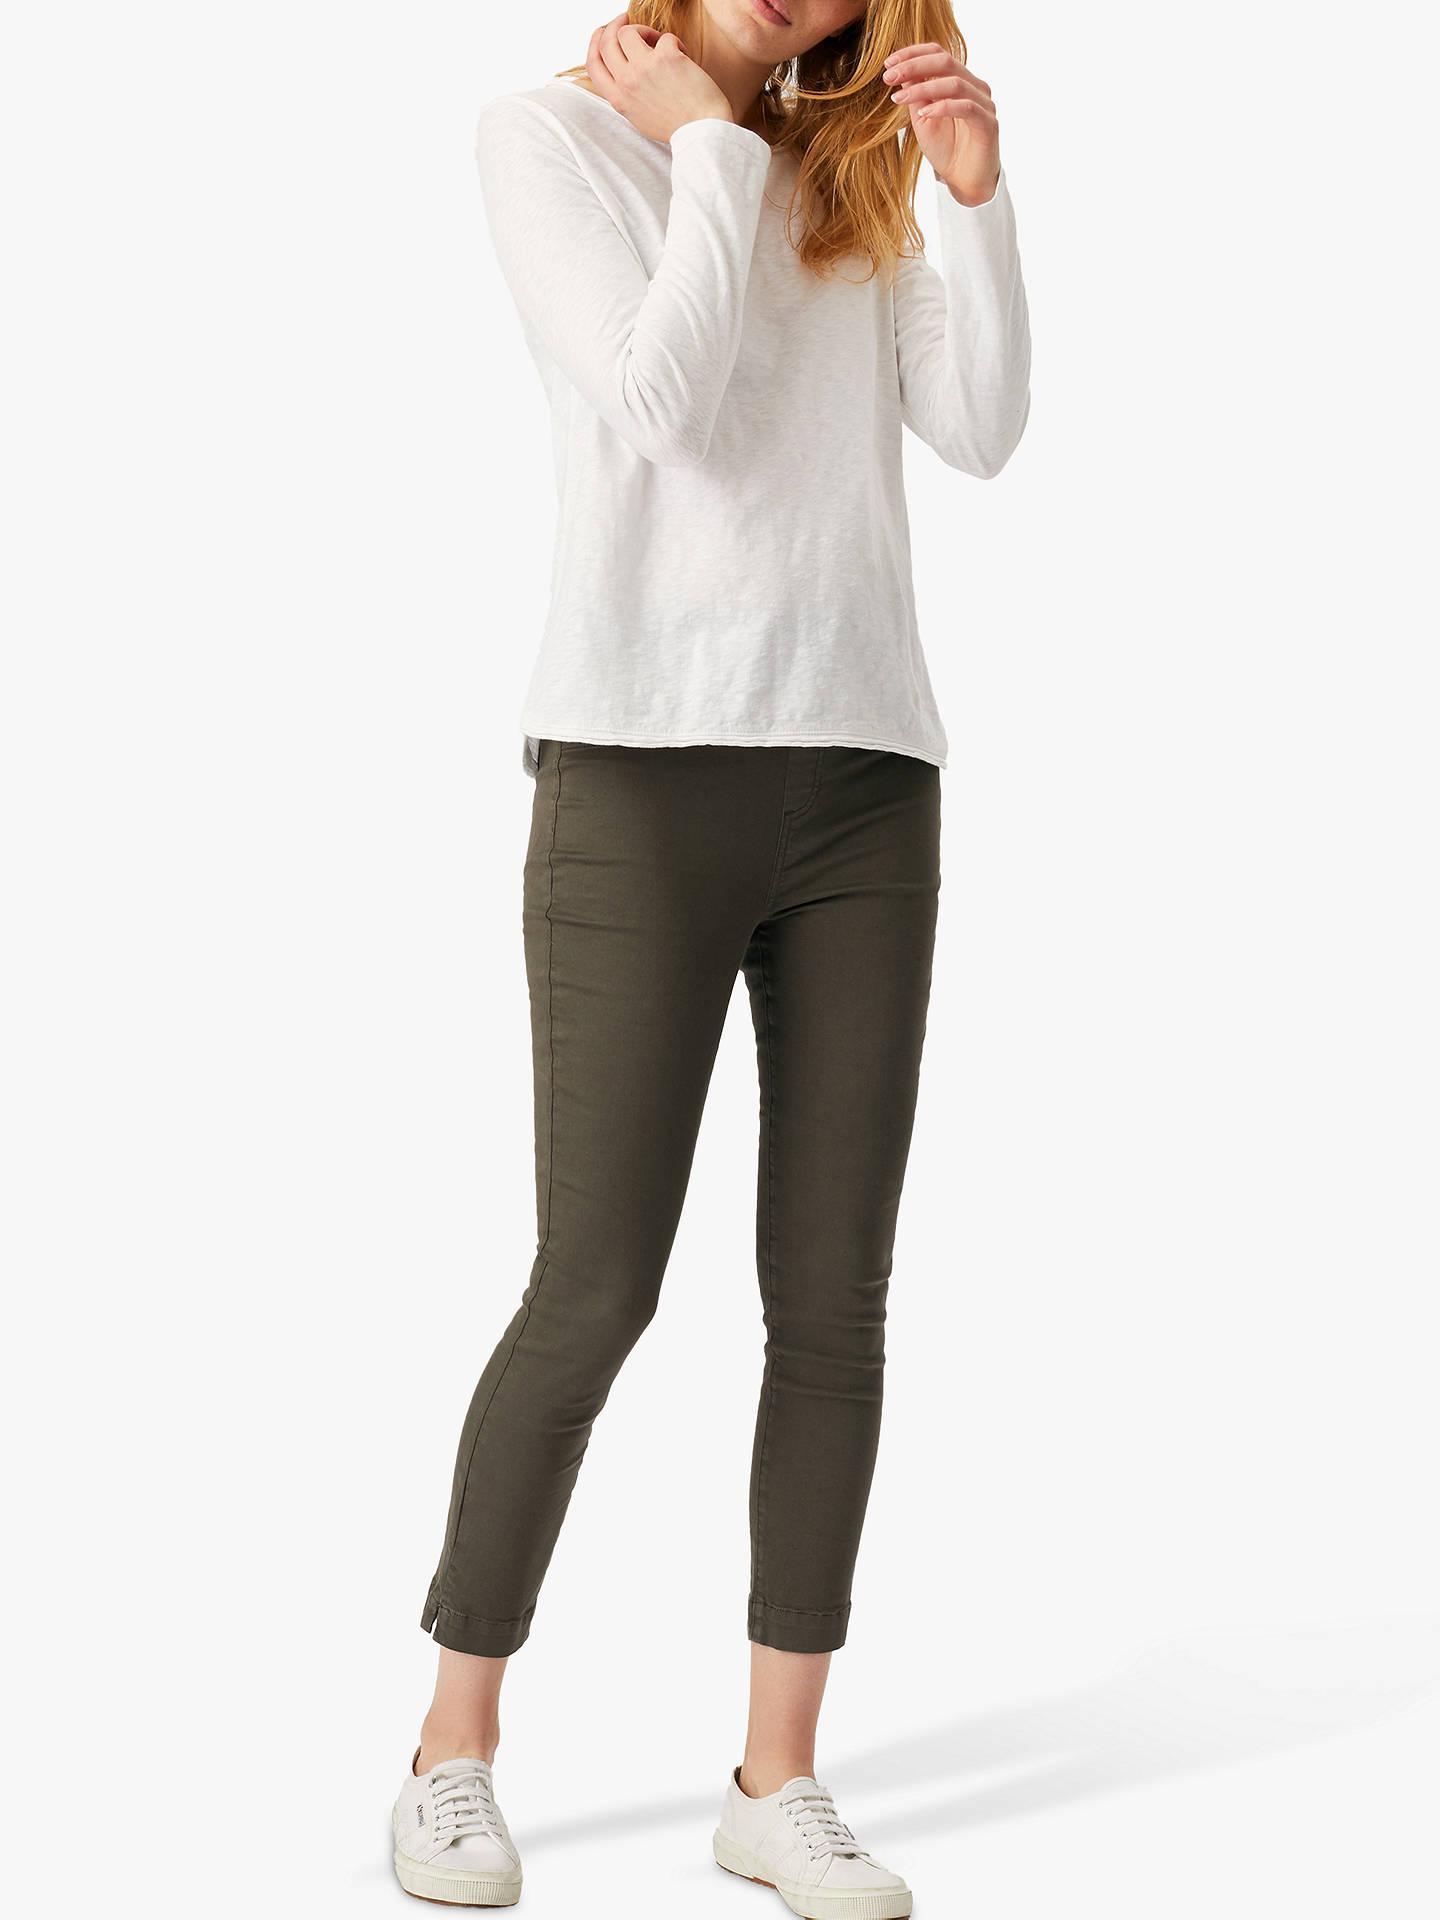 a1a126e8e5efc8 ... Buy White Stuff Jade Cropped Jegging Jeans, Khaki, 6R Online at  johnlewis.com ...